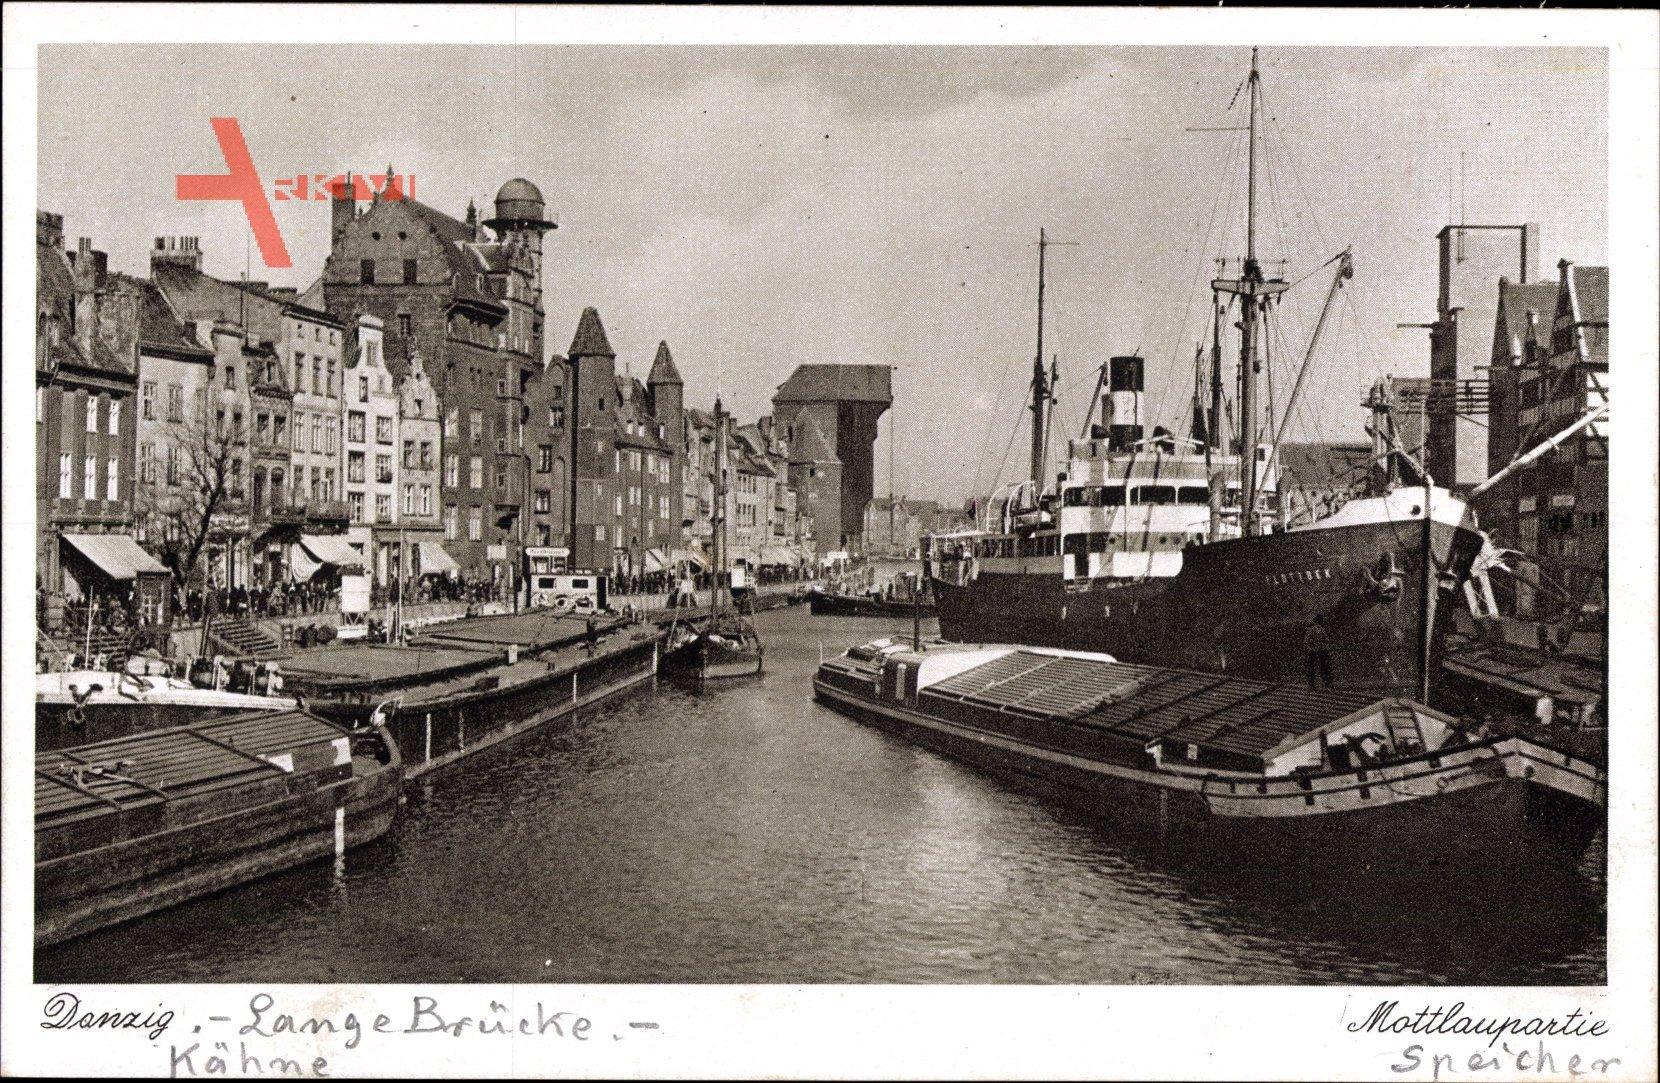 Gdańsk Danzig, Lange Brücke, Mottlaupartie, Krantor, Sternwarte, Lastkähne